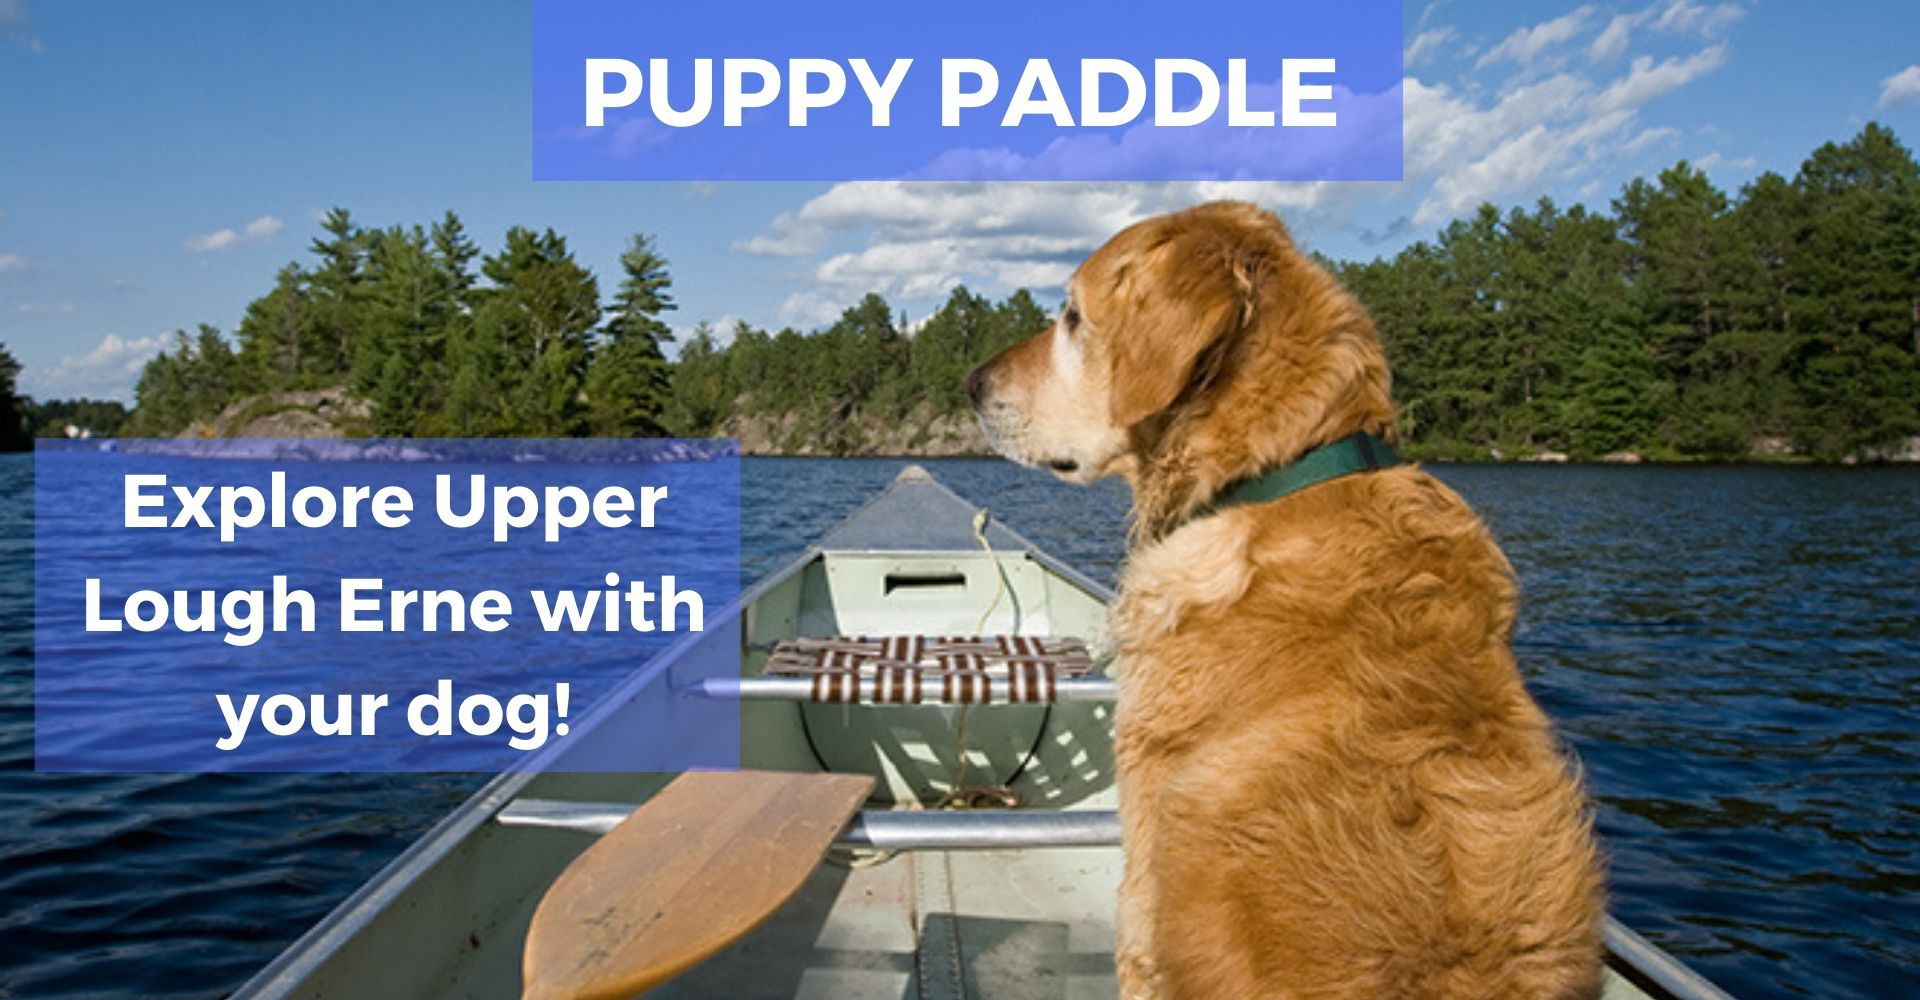 Puppy Paddle